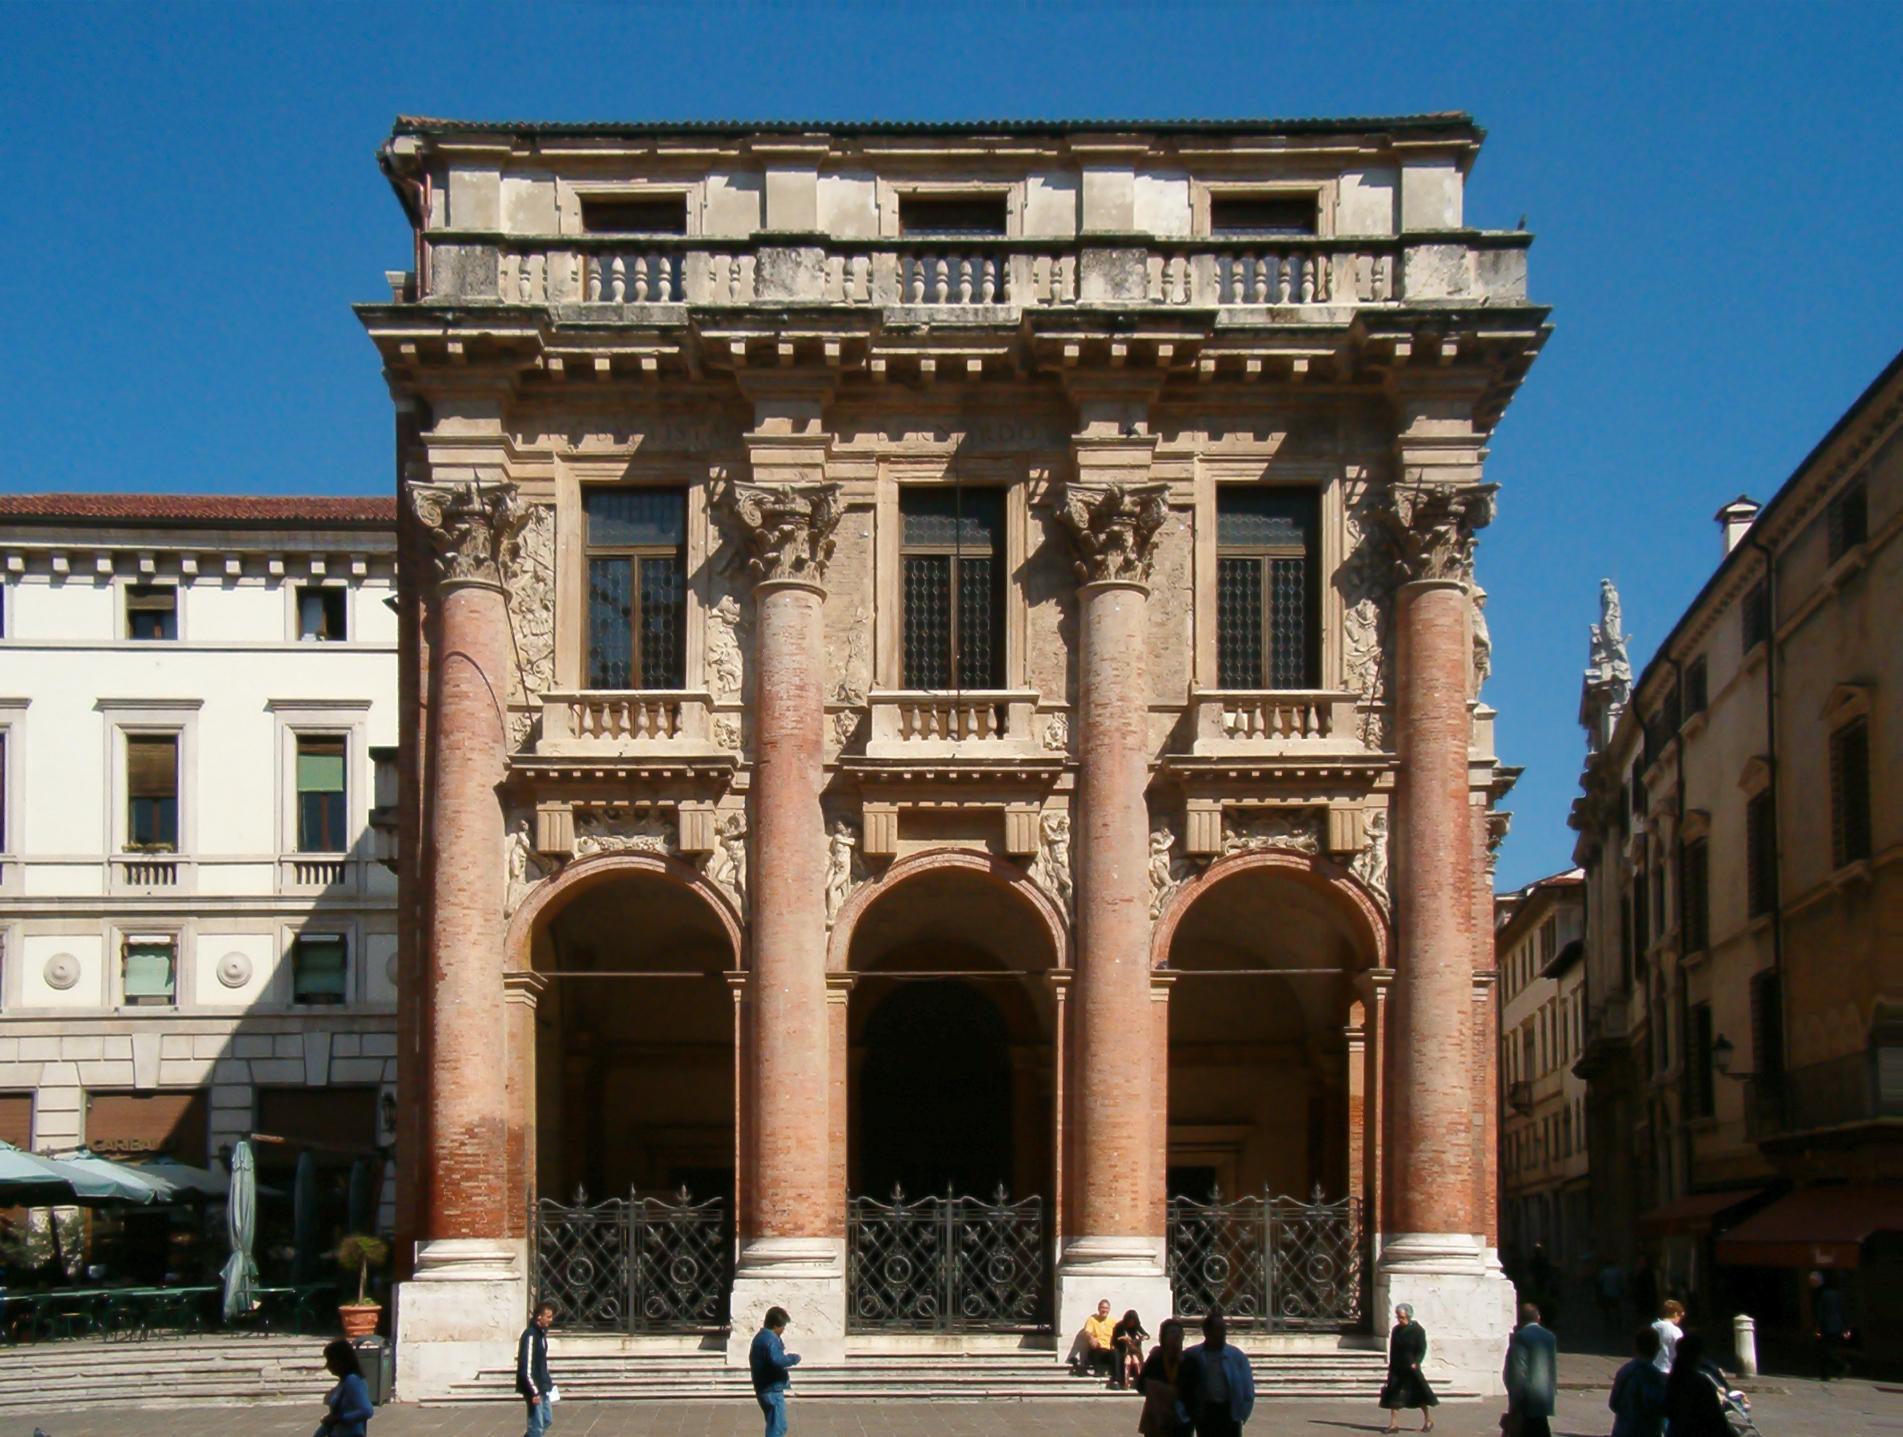 Palazzo_del_Capitanio_-_Vicenza.jpg